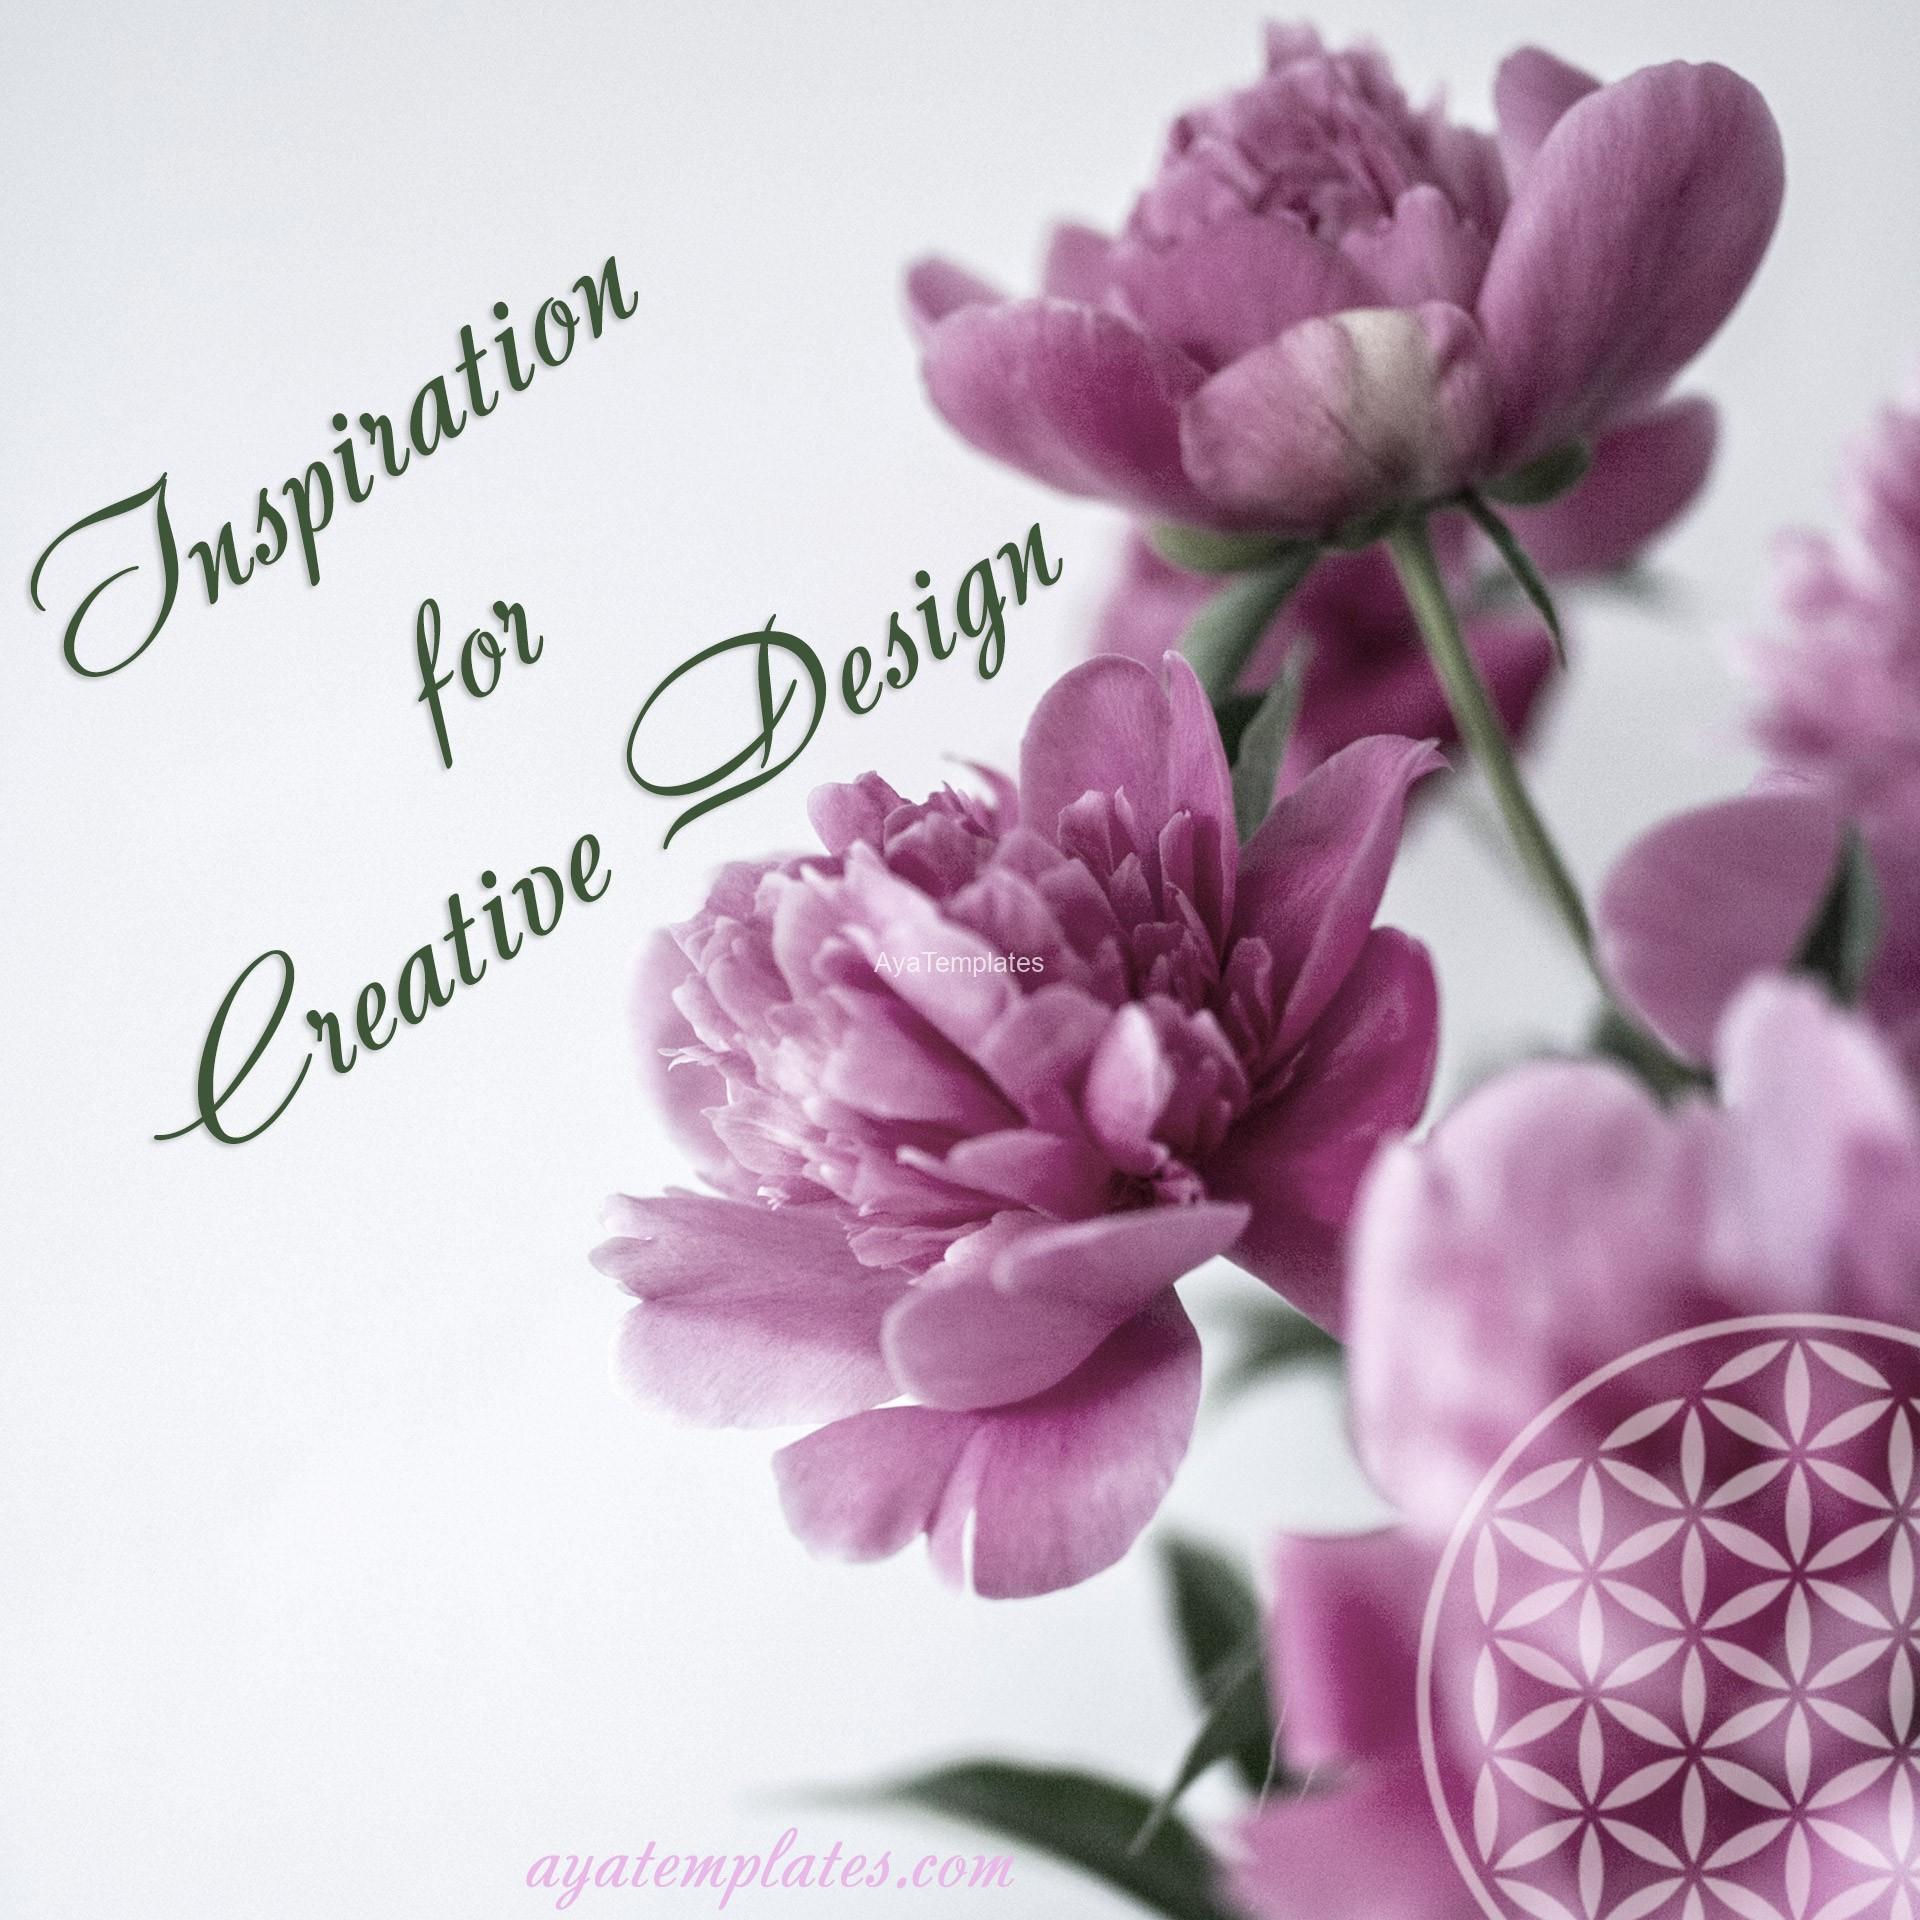 Design-Quotes-Inspiration-for-creative-design-cover-book